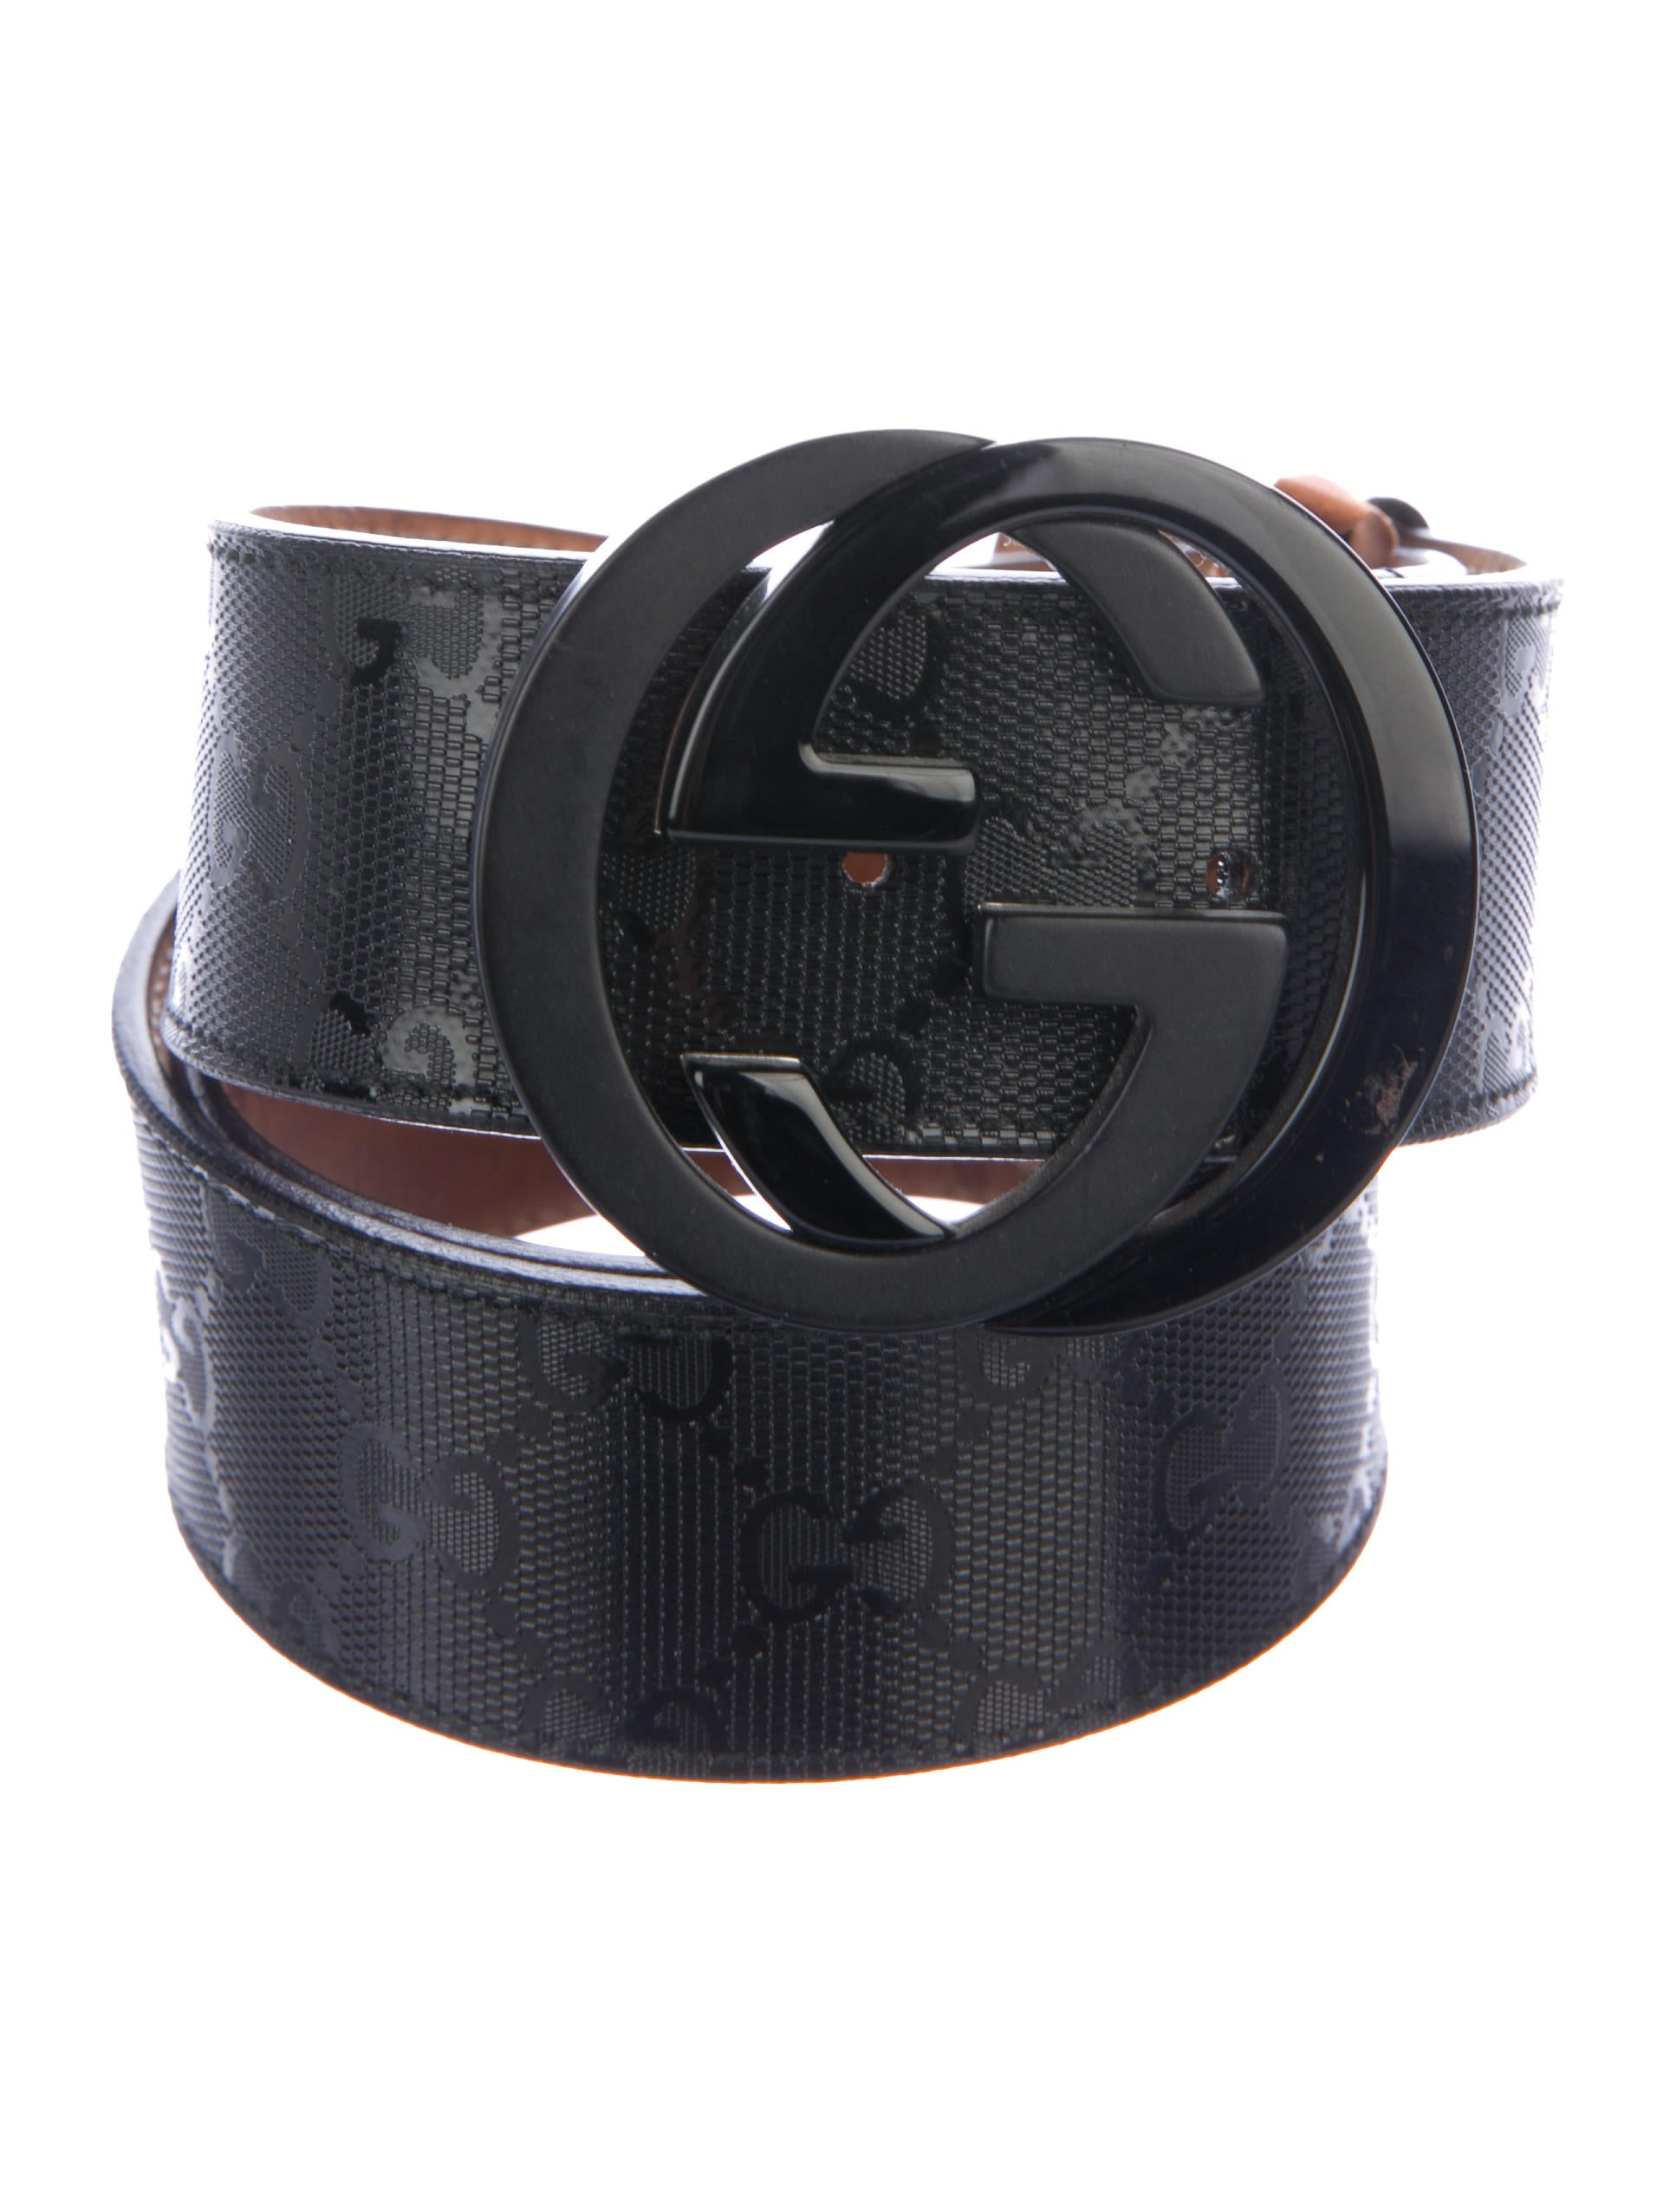 baee15db39a Gucci GG Imprimé Belt - Accessories - GUC217853